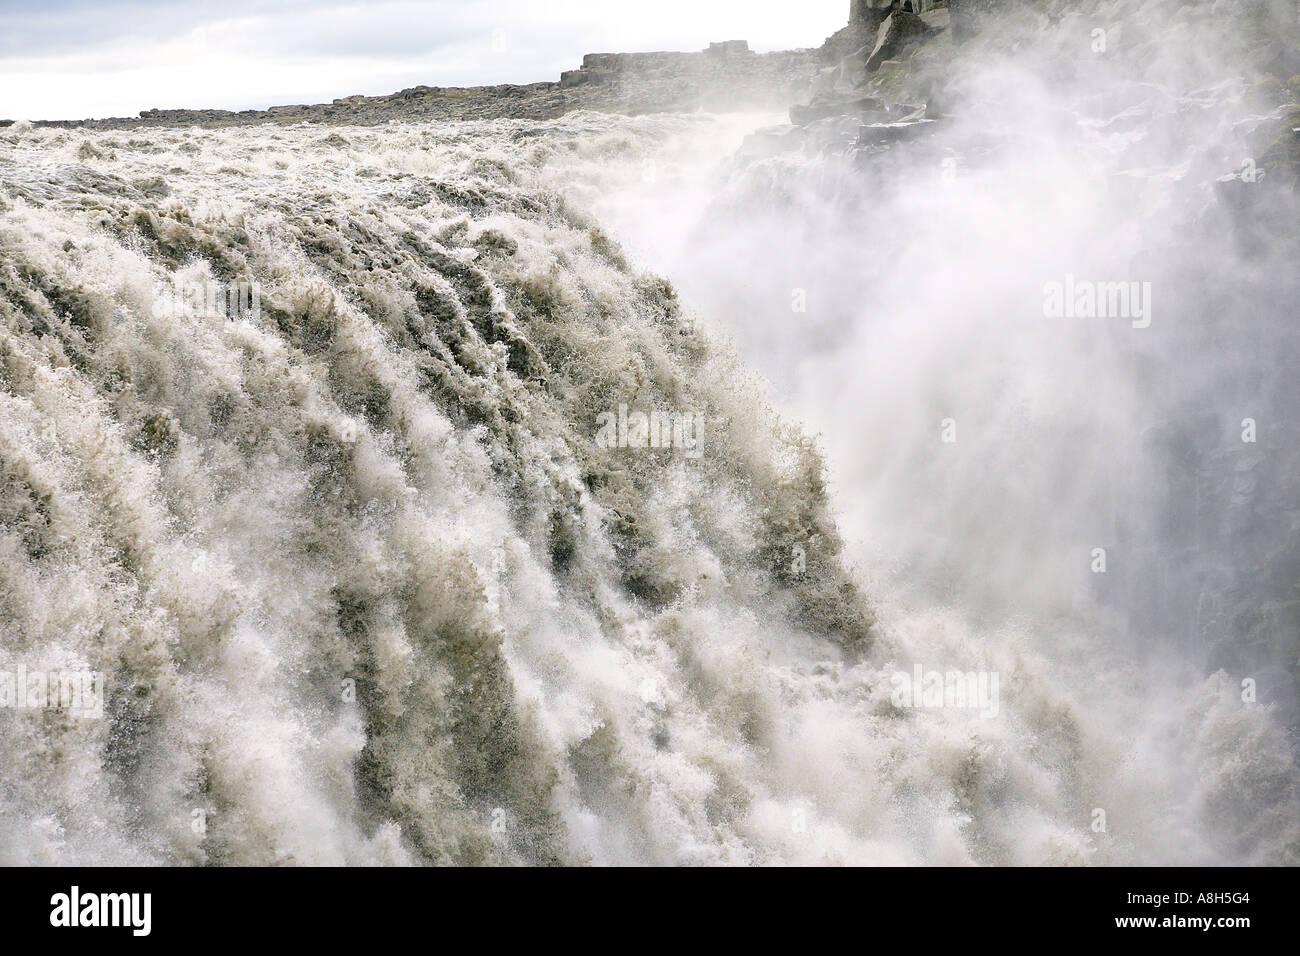 Dettifoss Water Falls Iceland - Stock Image